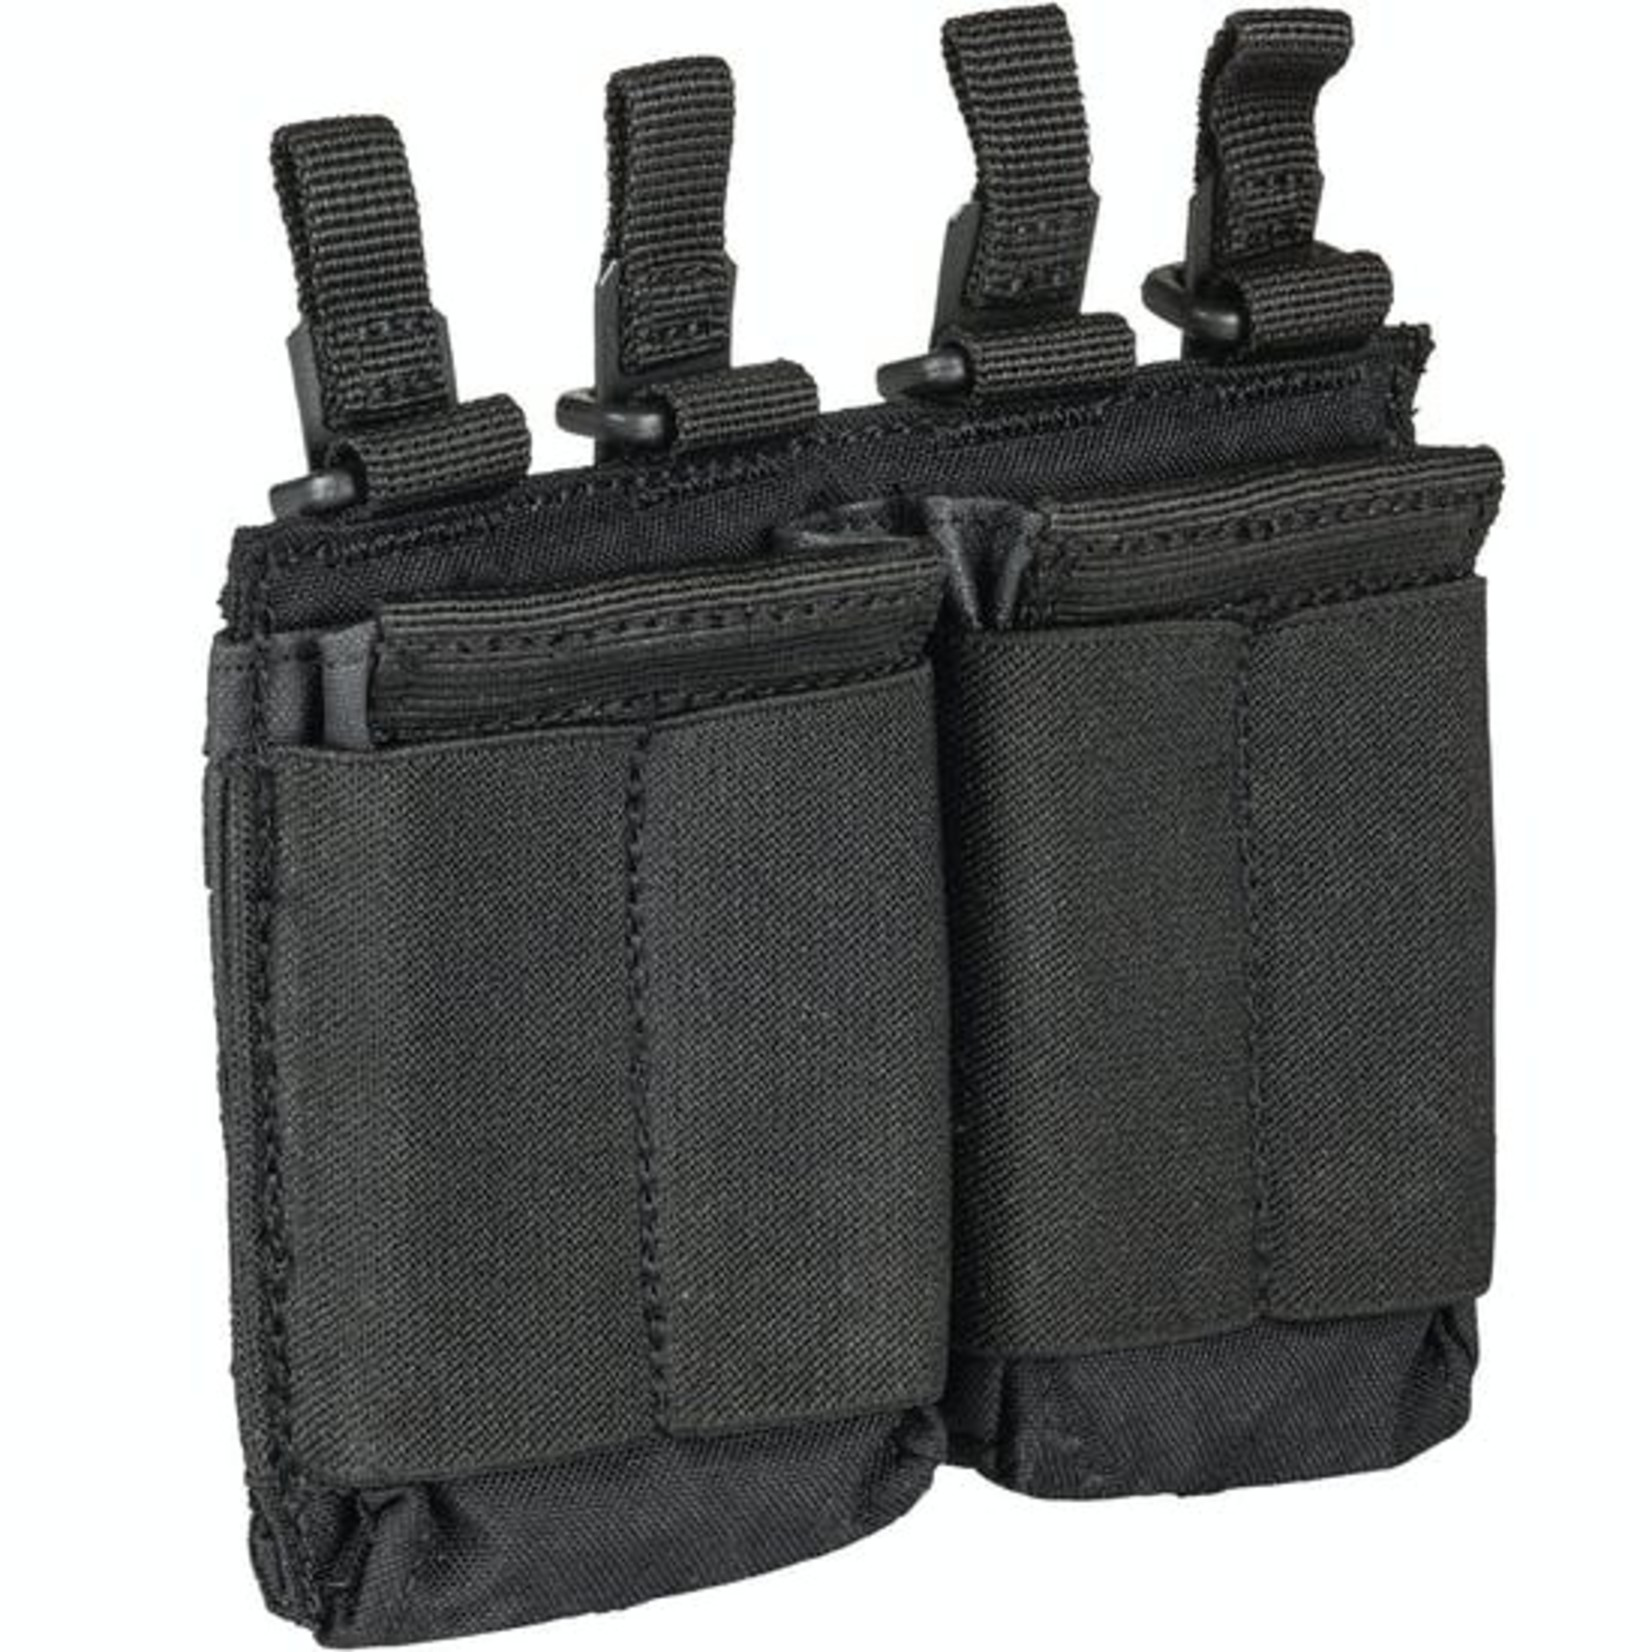 5.11 Tactical 5.11 Flex Double AR Mag Pouch